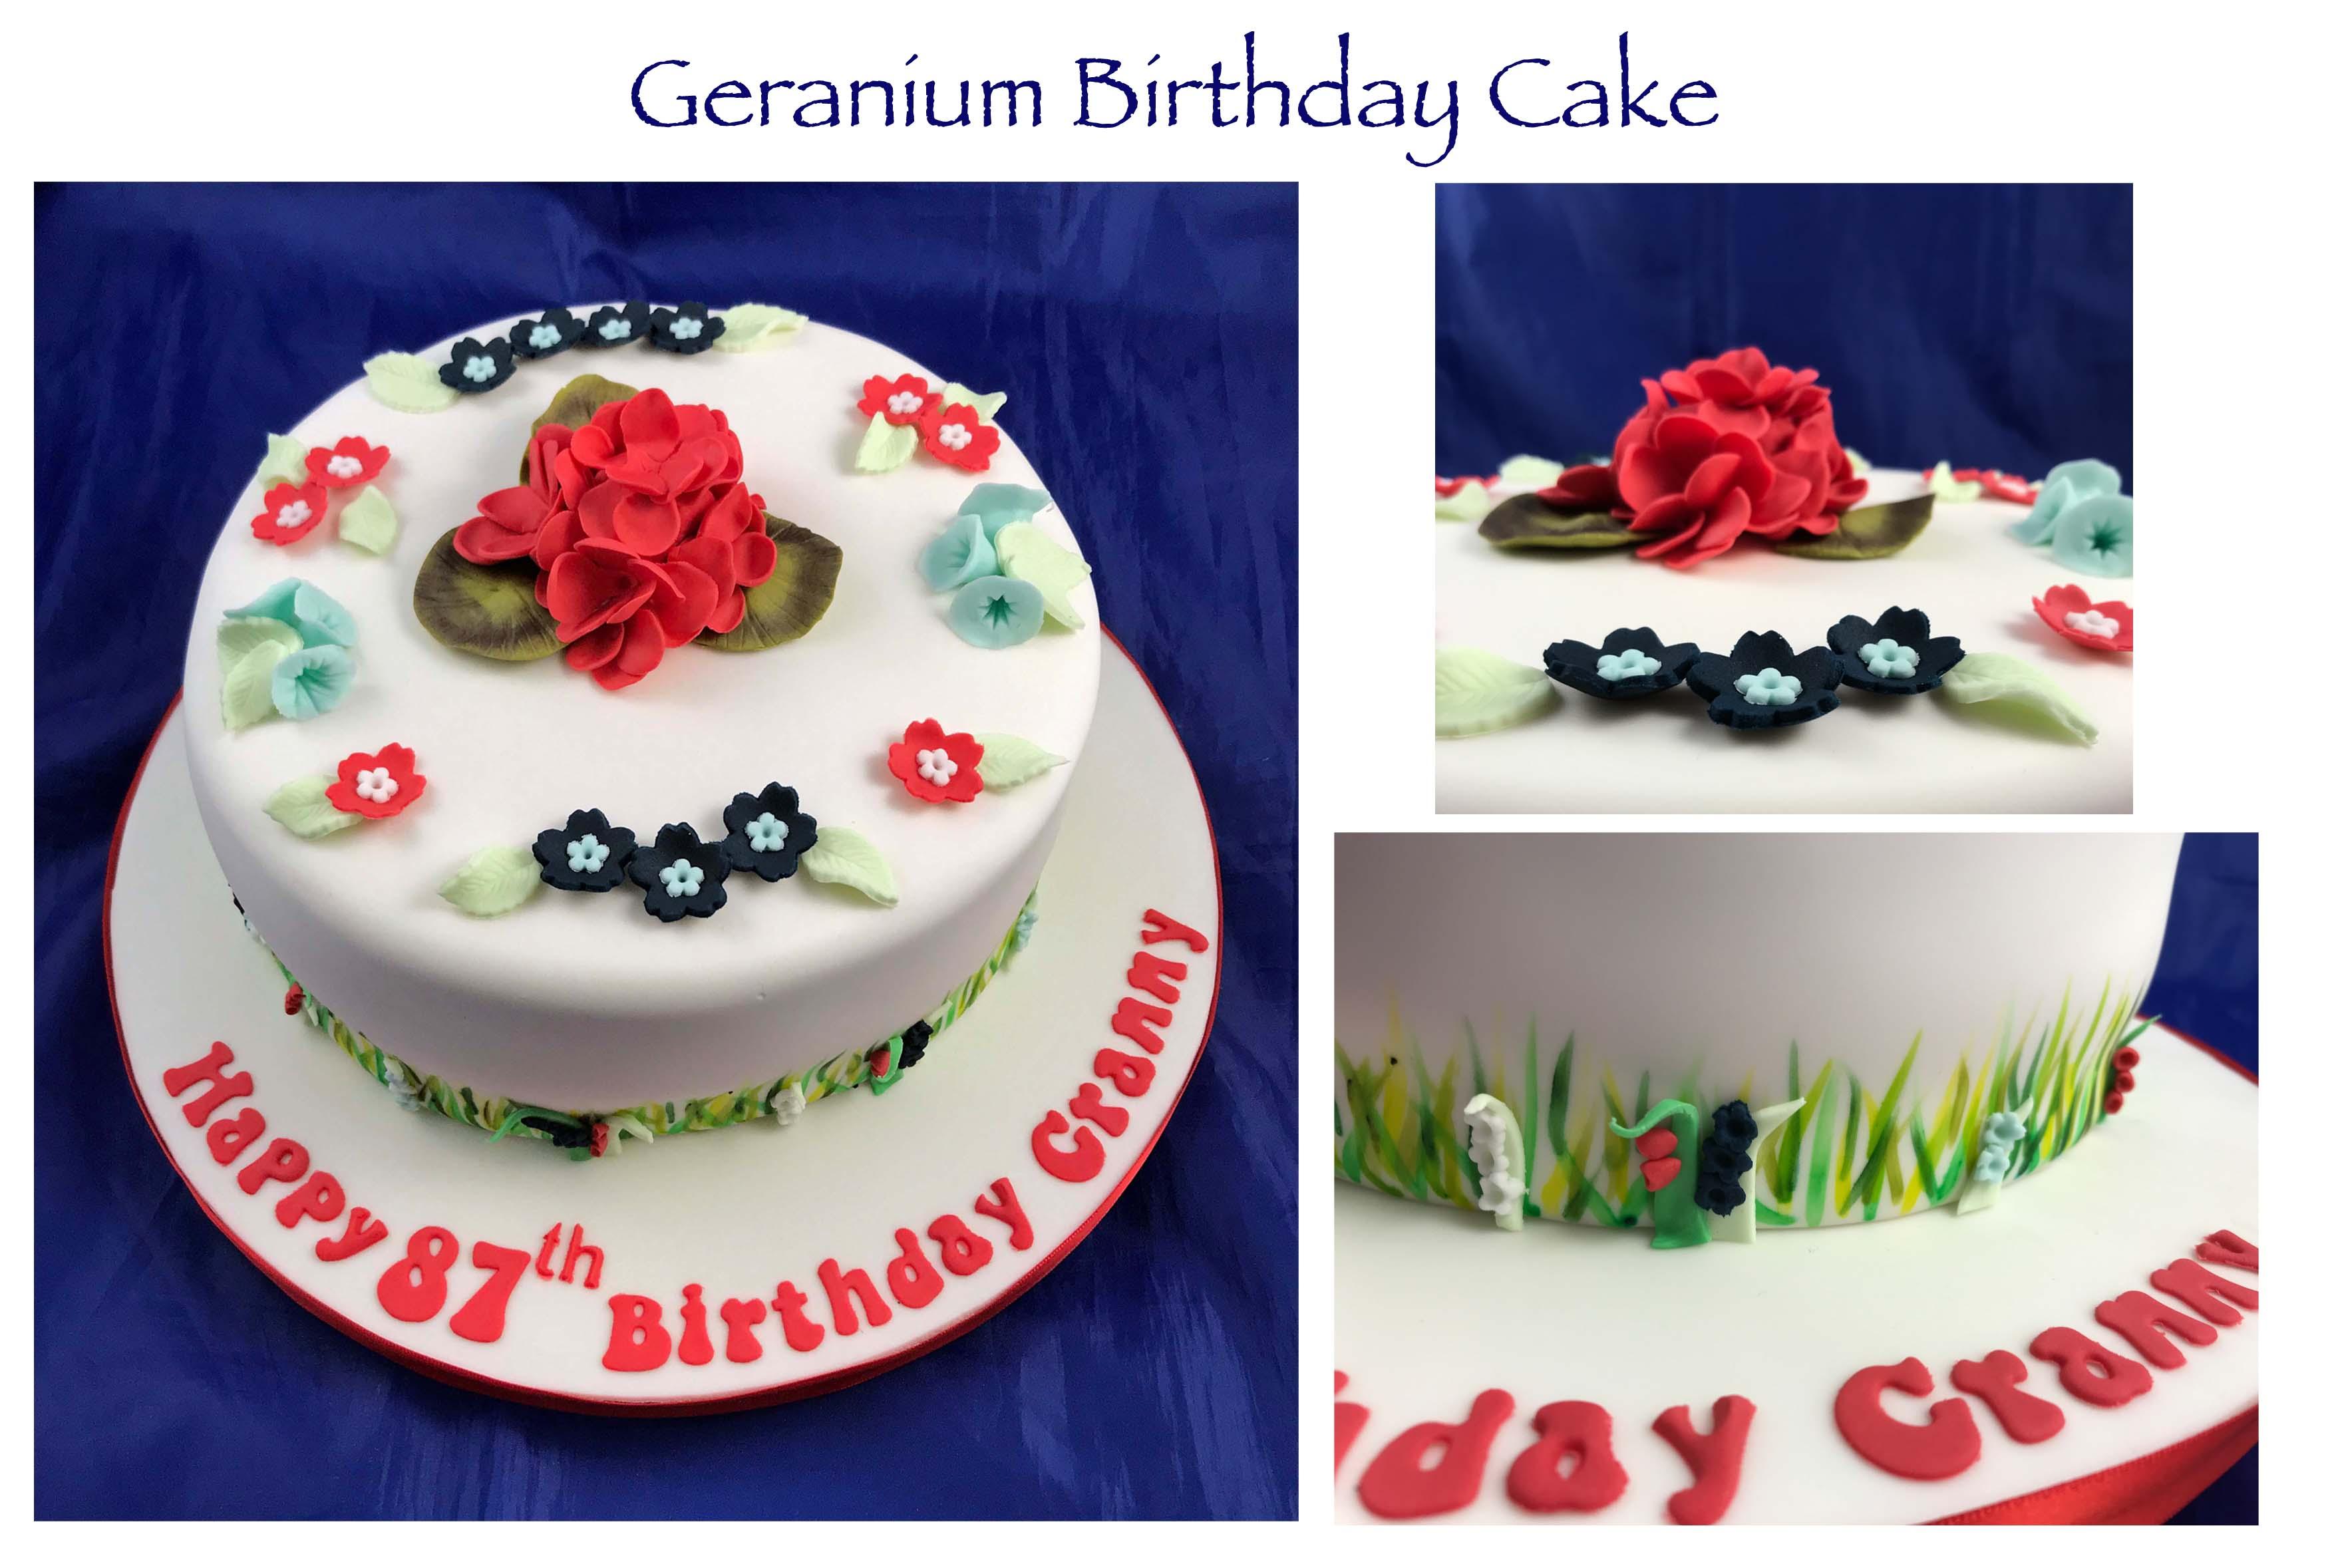 Geranium Birthday Cake